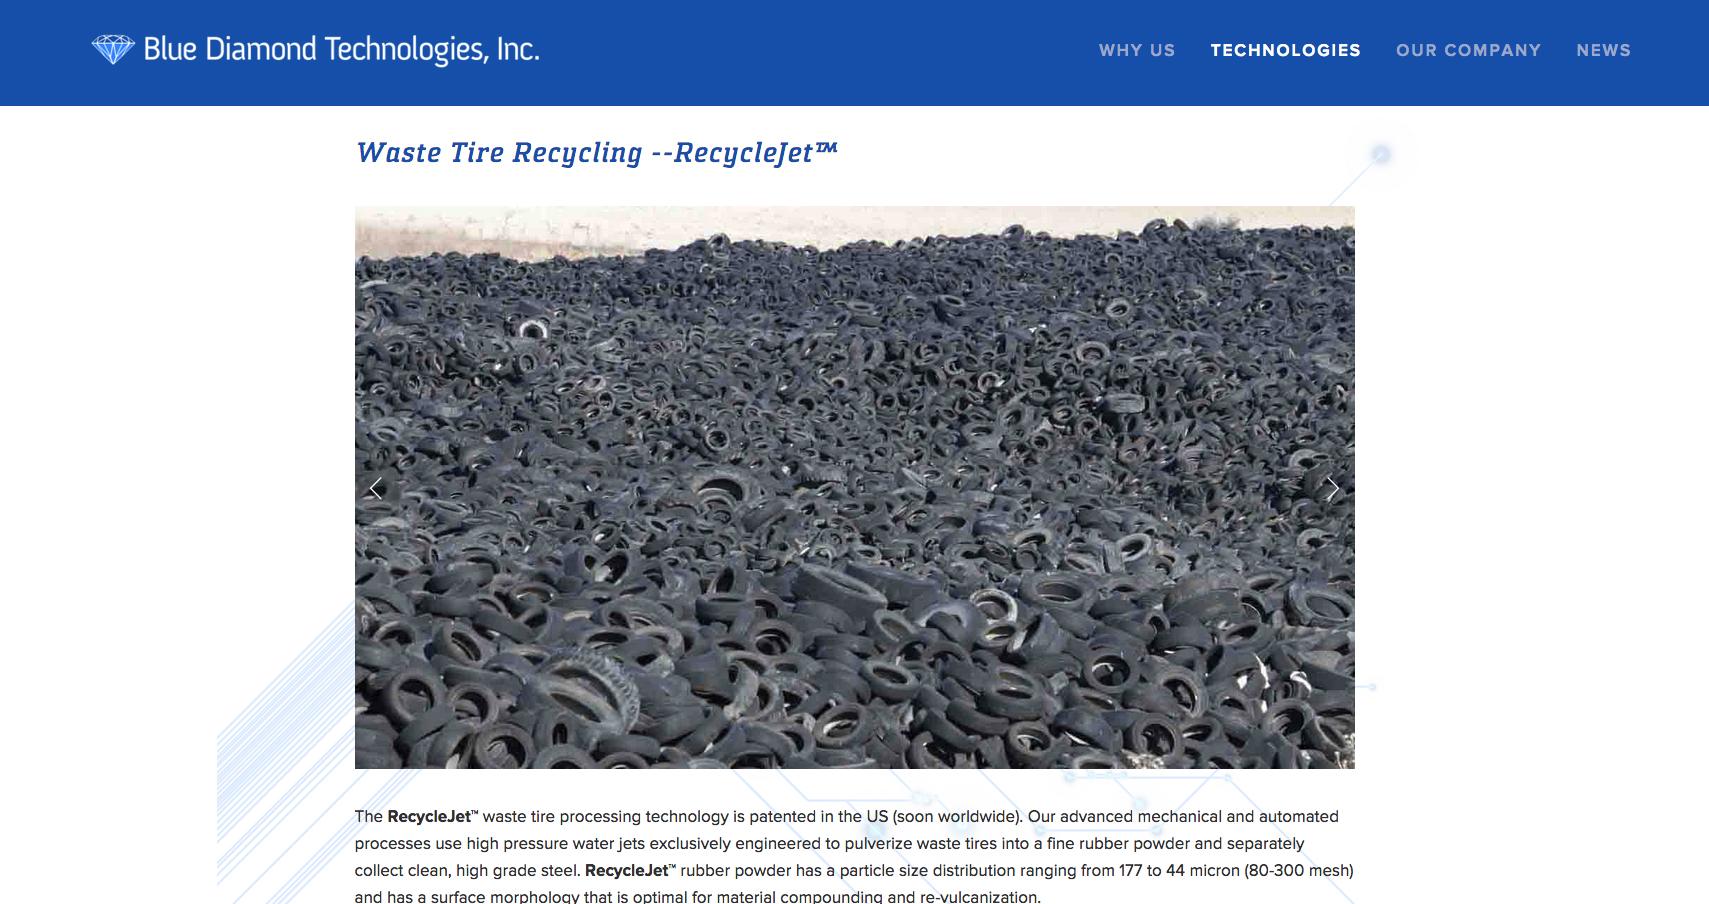 bluediamond-recycling.jpg